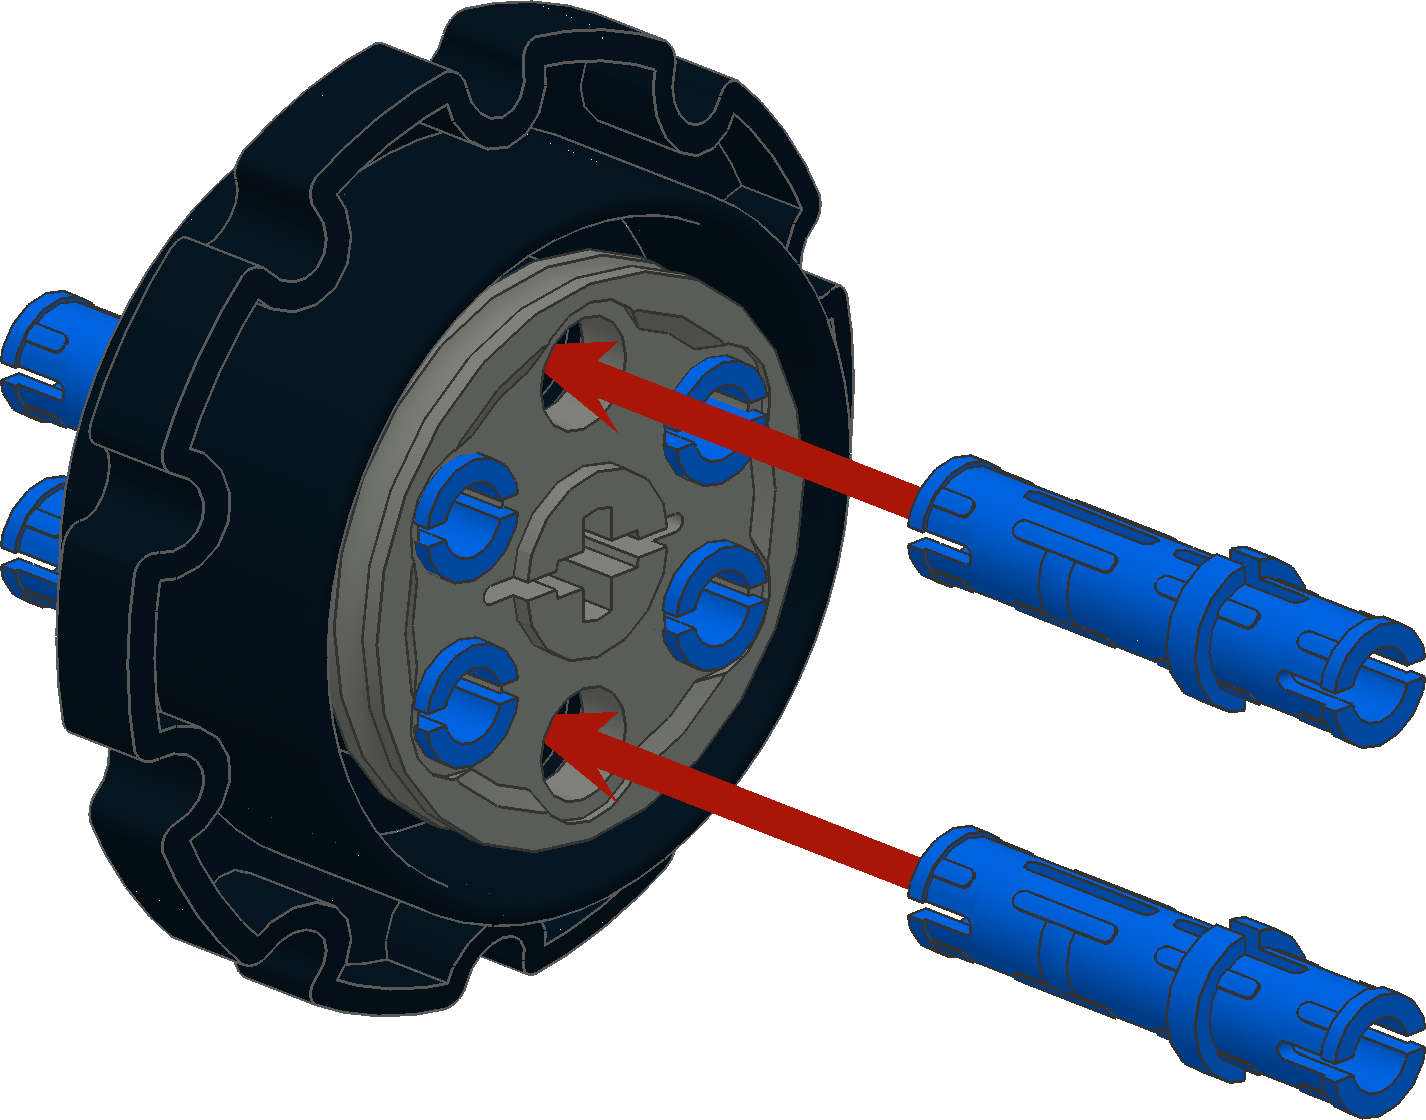 ev3wayet18_wheel_arrow_1_0_0_0_1_0_0_0_1_3_4960_600_DPI_1.png